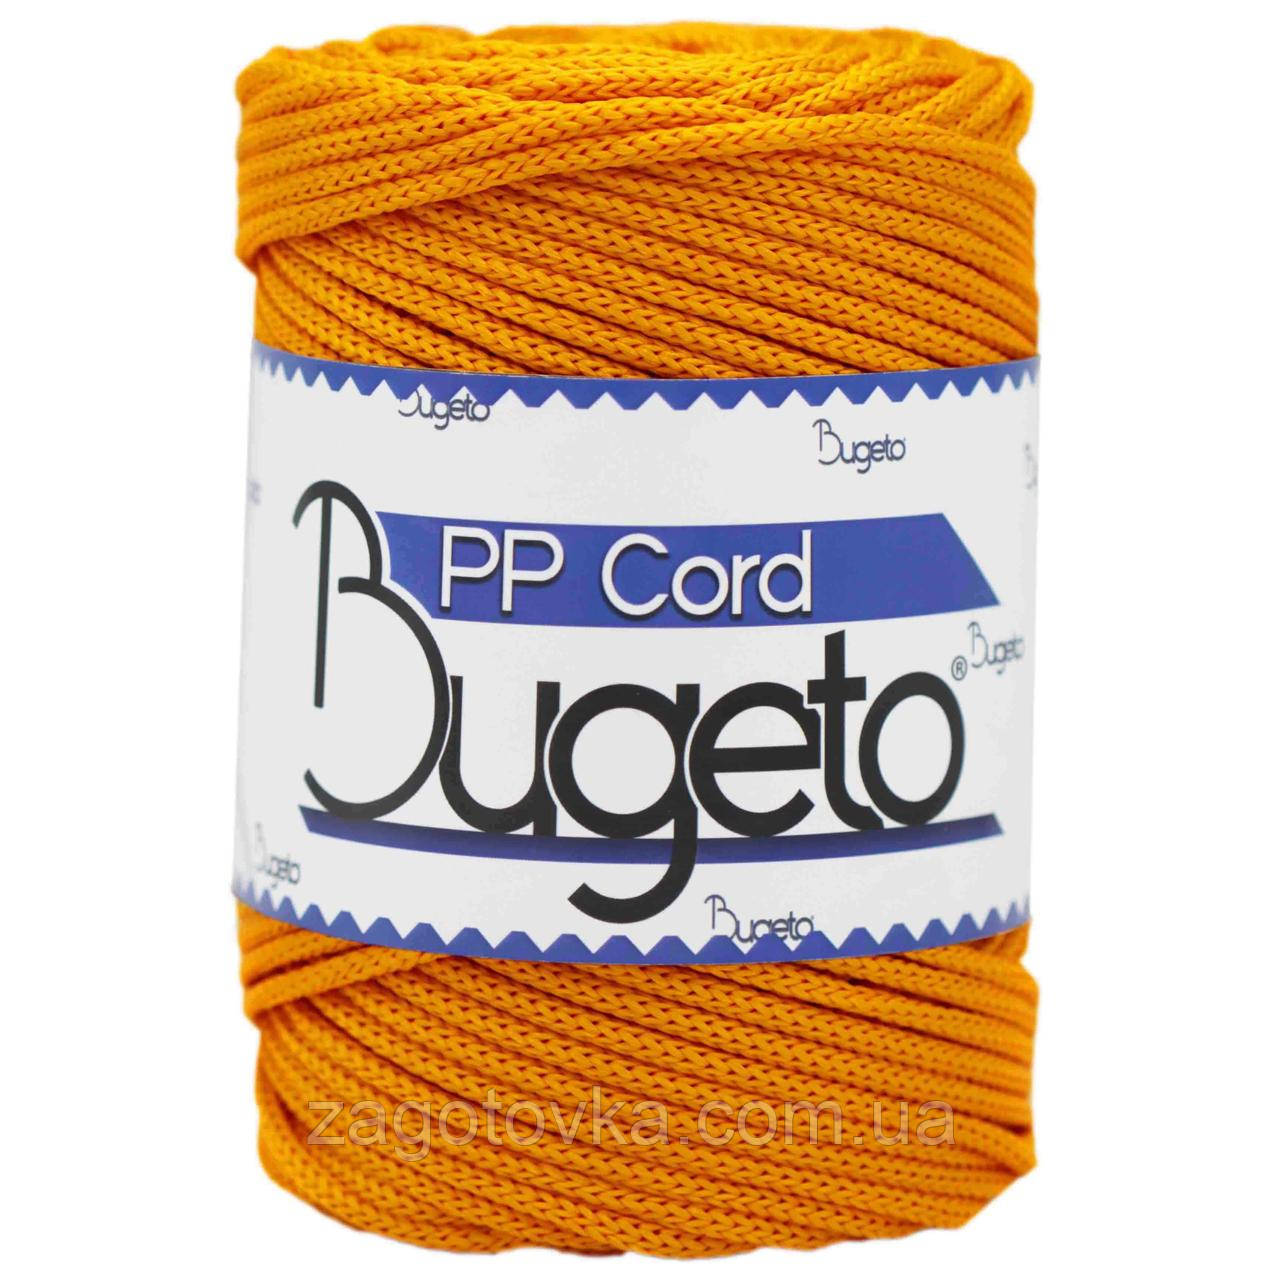 Полипропиленовый шнур Bugeto PP Cord 5mm, Оранжево-желтый